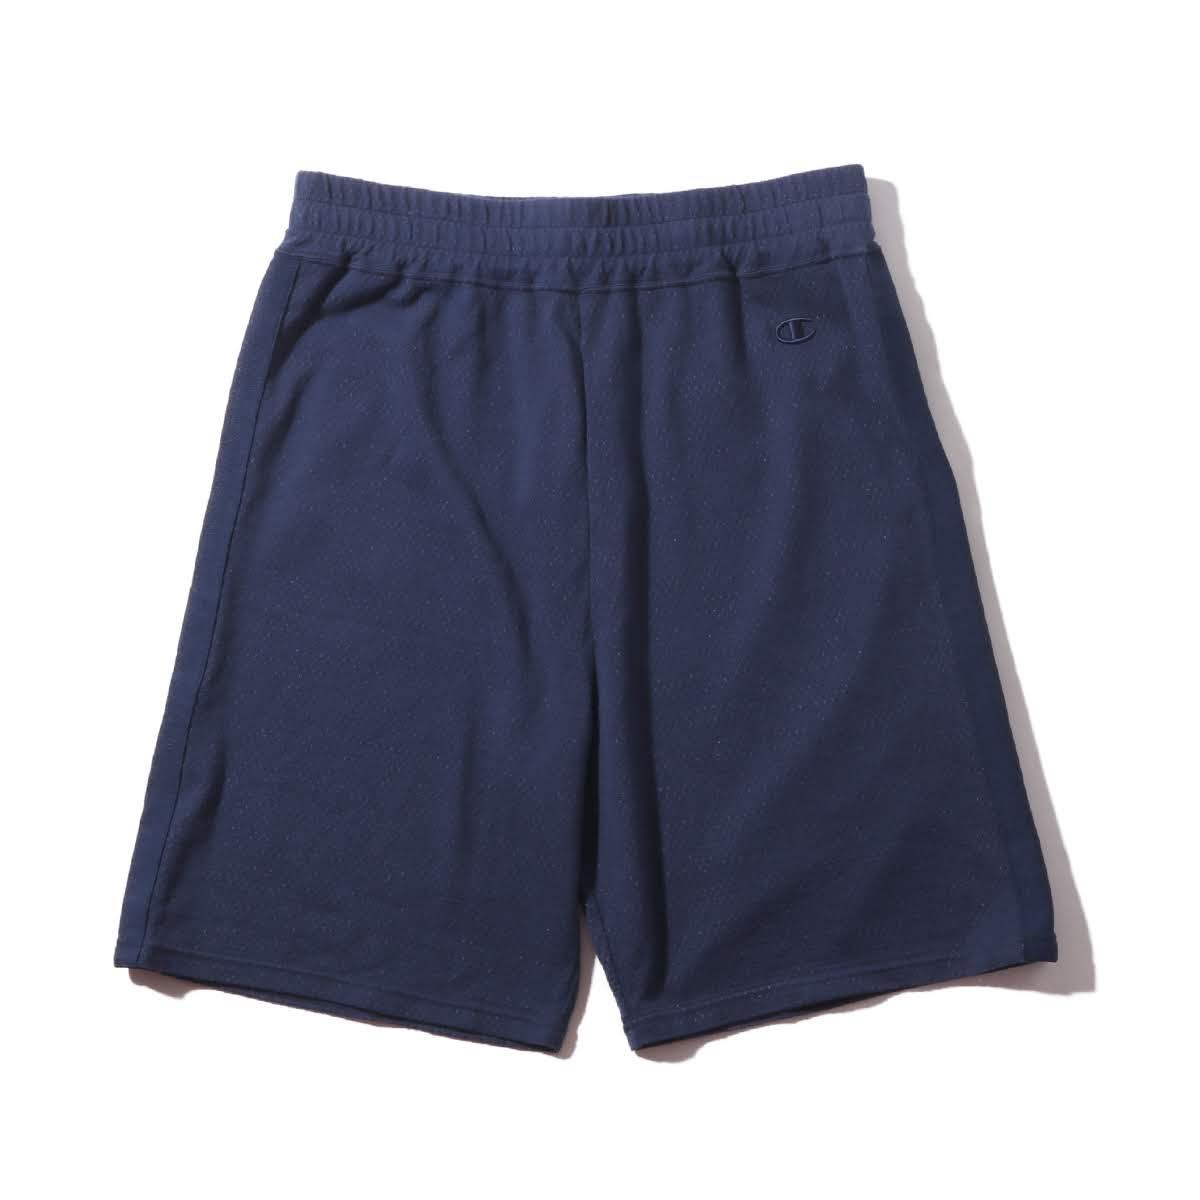 CHAMPION Mesh Jersey Basketball Shorts(チャンピオン メッシュ バスケットボール ショーツ)2色展開【メンズ ハーフパンツ】